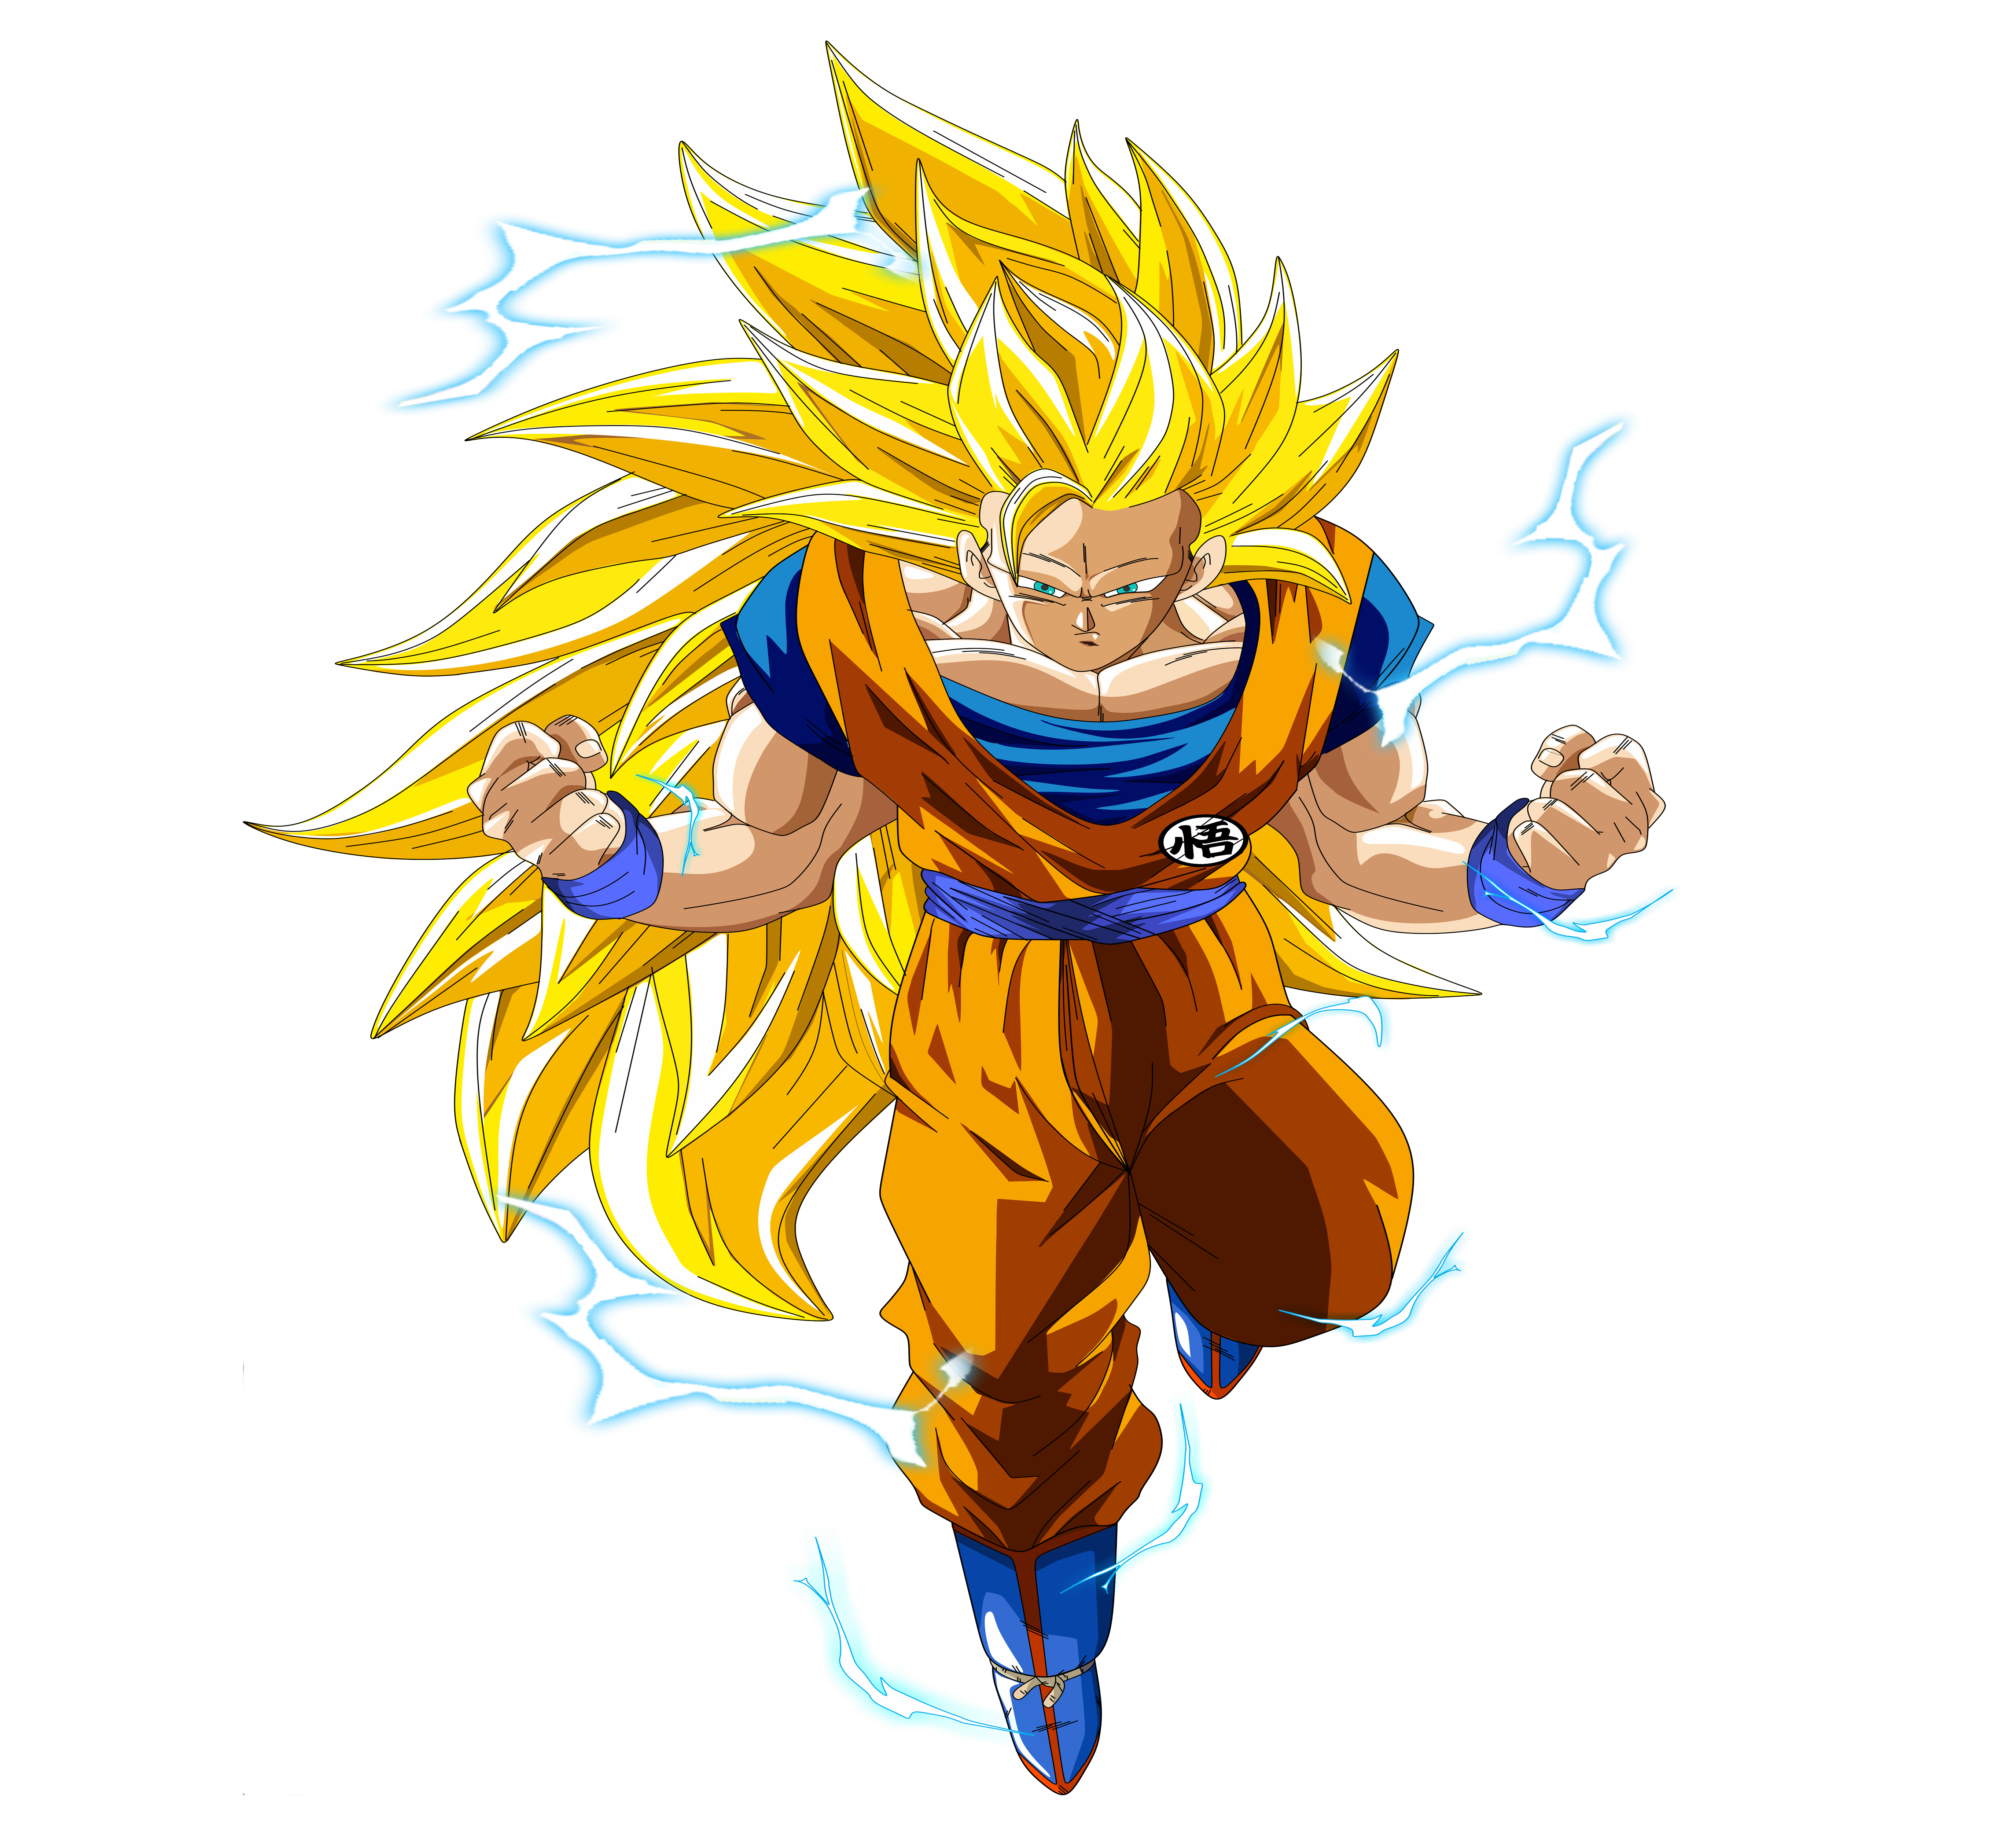 Goku Wallpaper Hd: Goku SSJ3 5k Retina Ultra HD Wallpaper